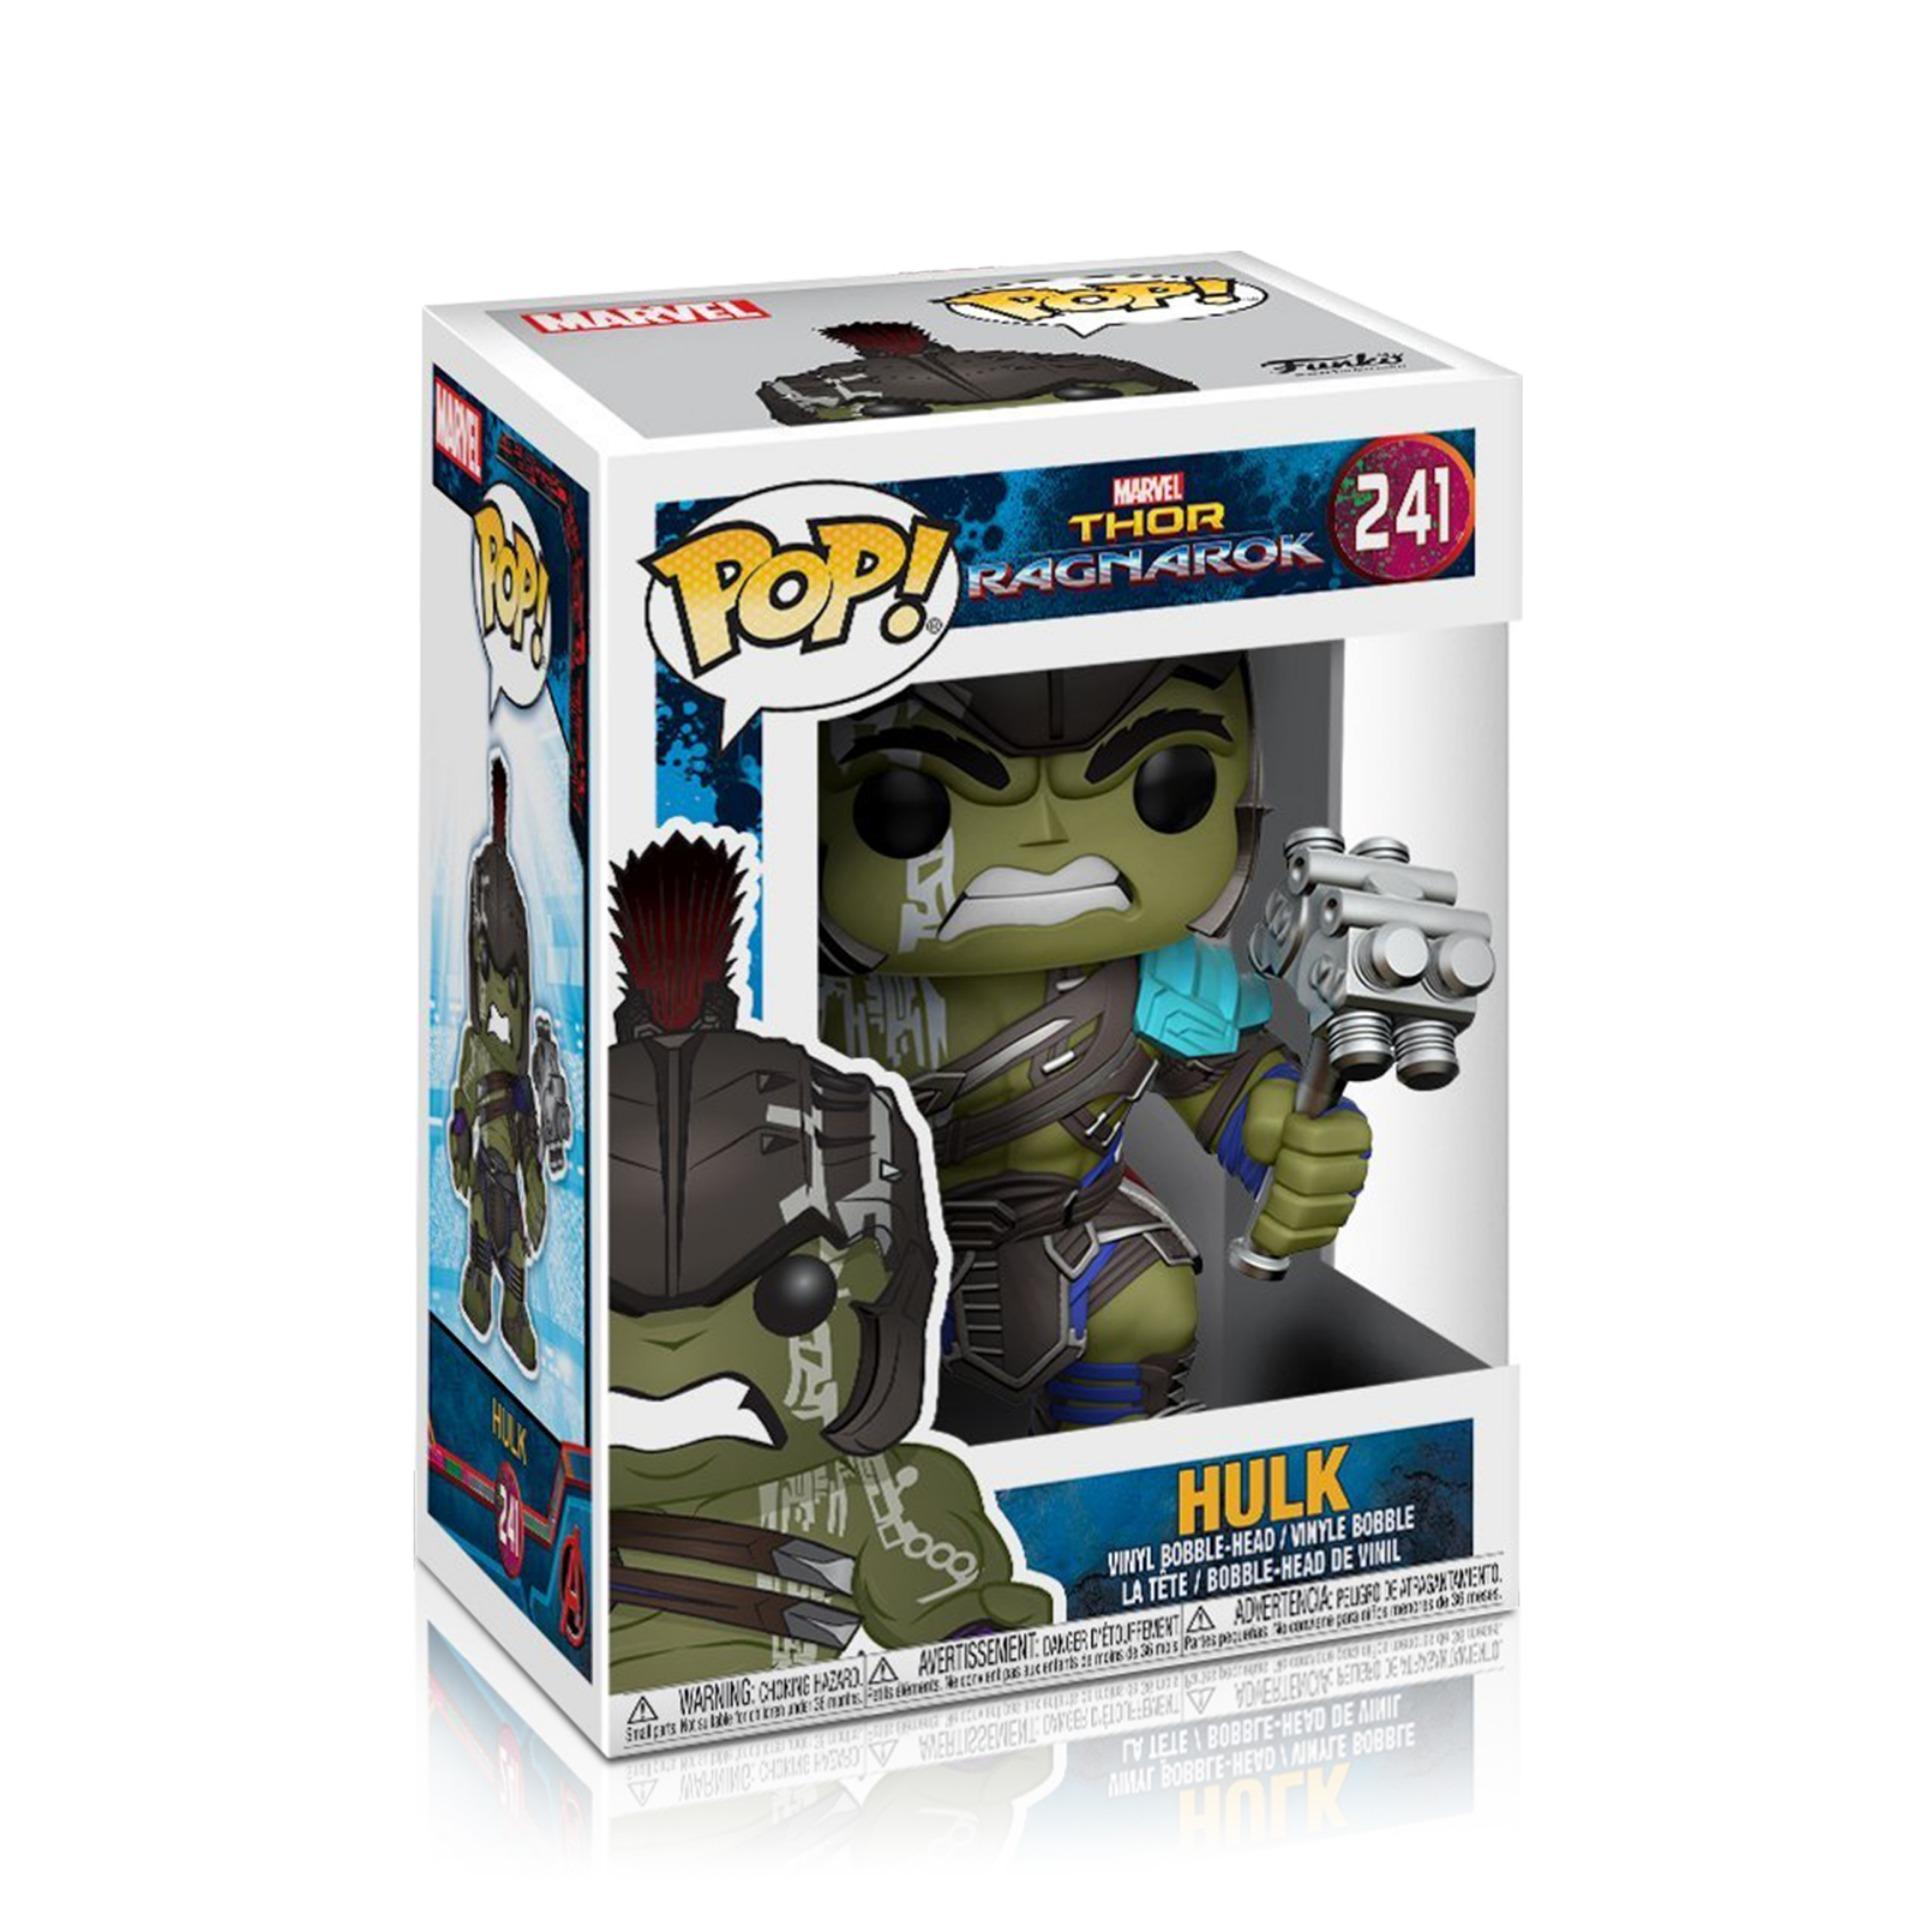 Pop Marvel Thor Ragnarok 241 Gladiator Hulk W Helmet Funko Pop Discount